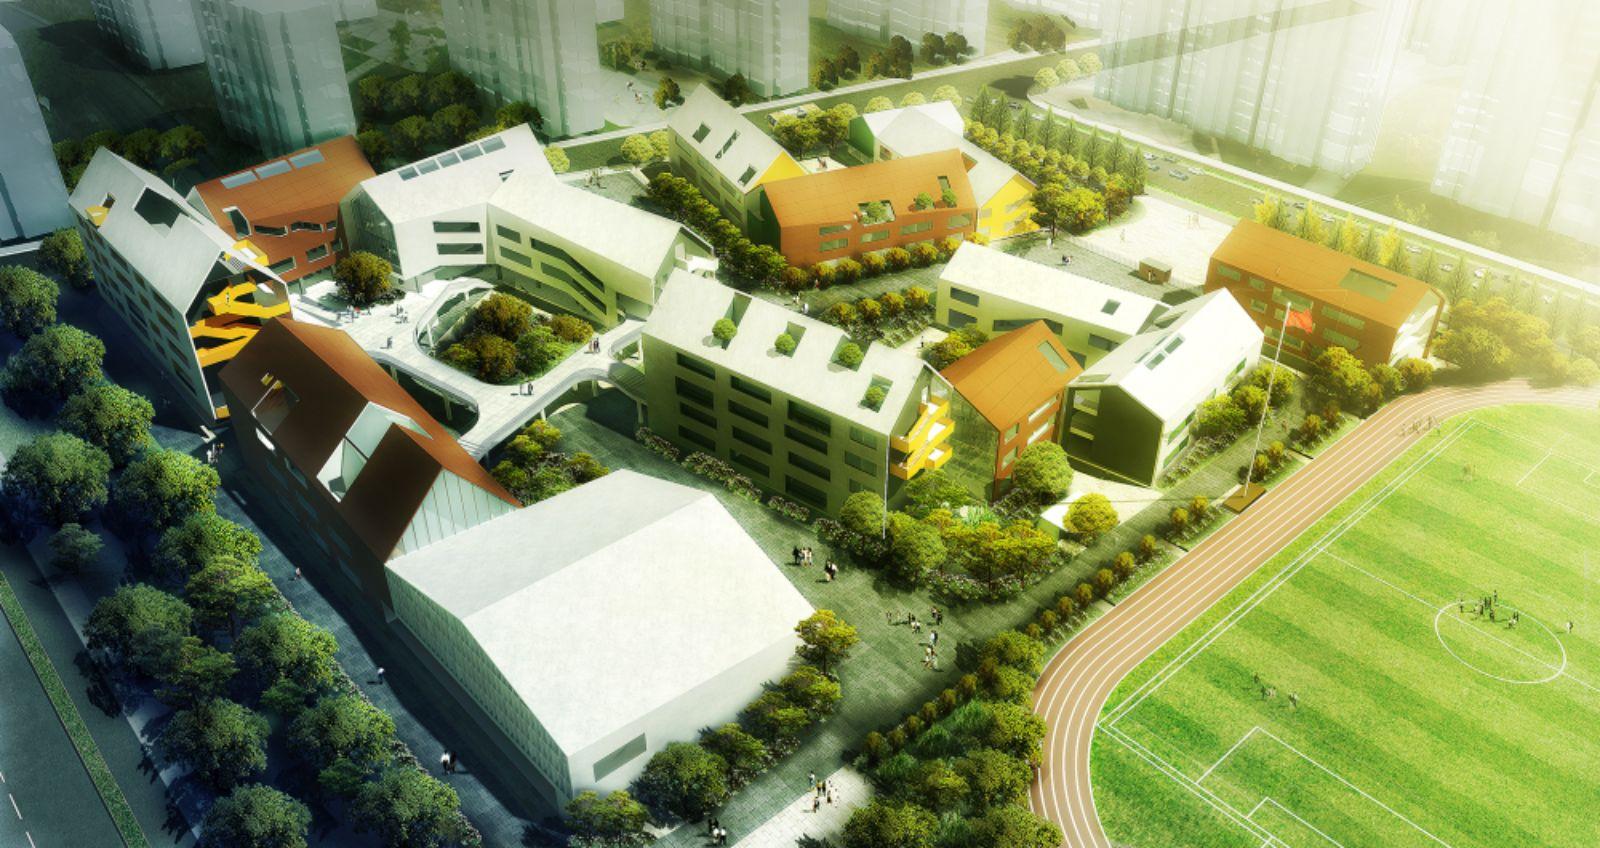 Yuhang NO.2 School